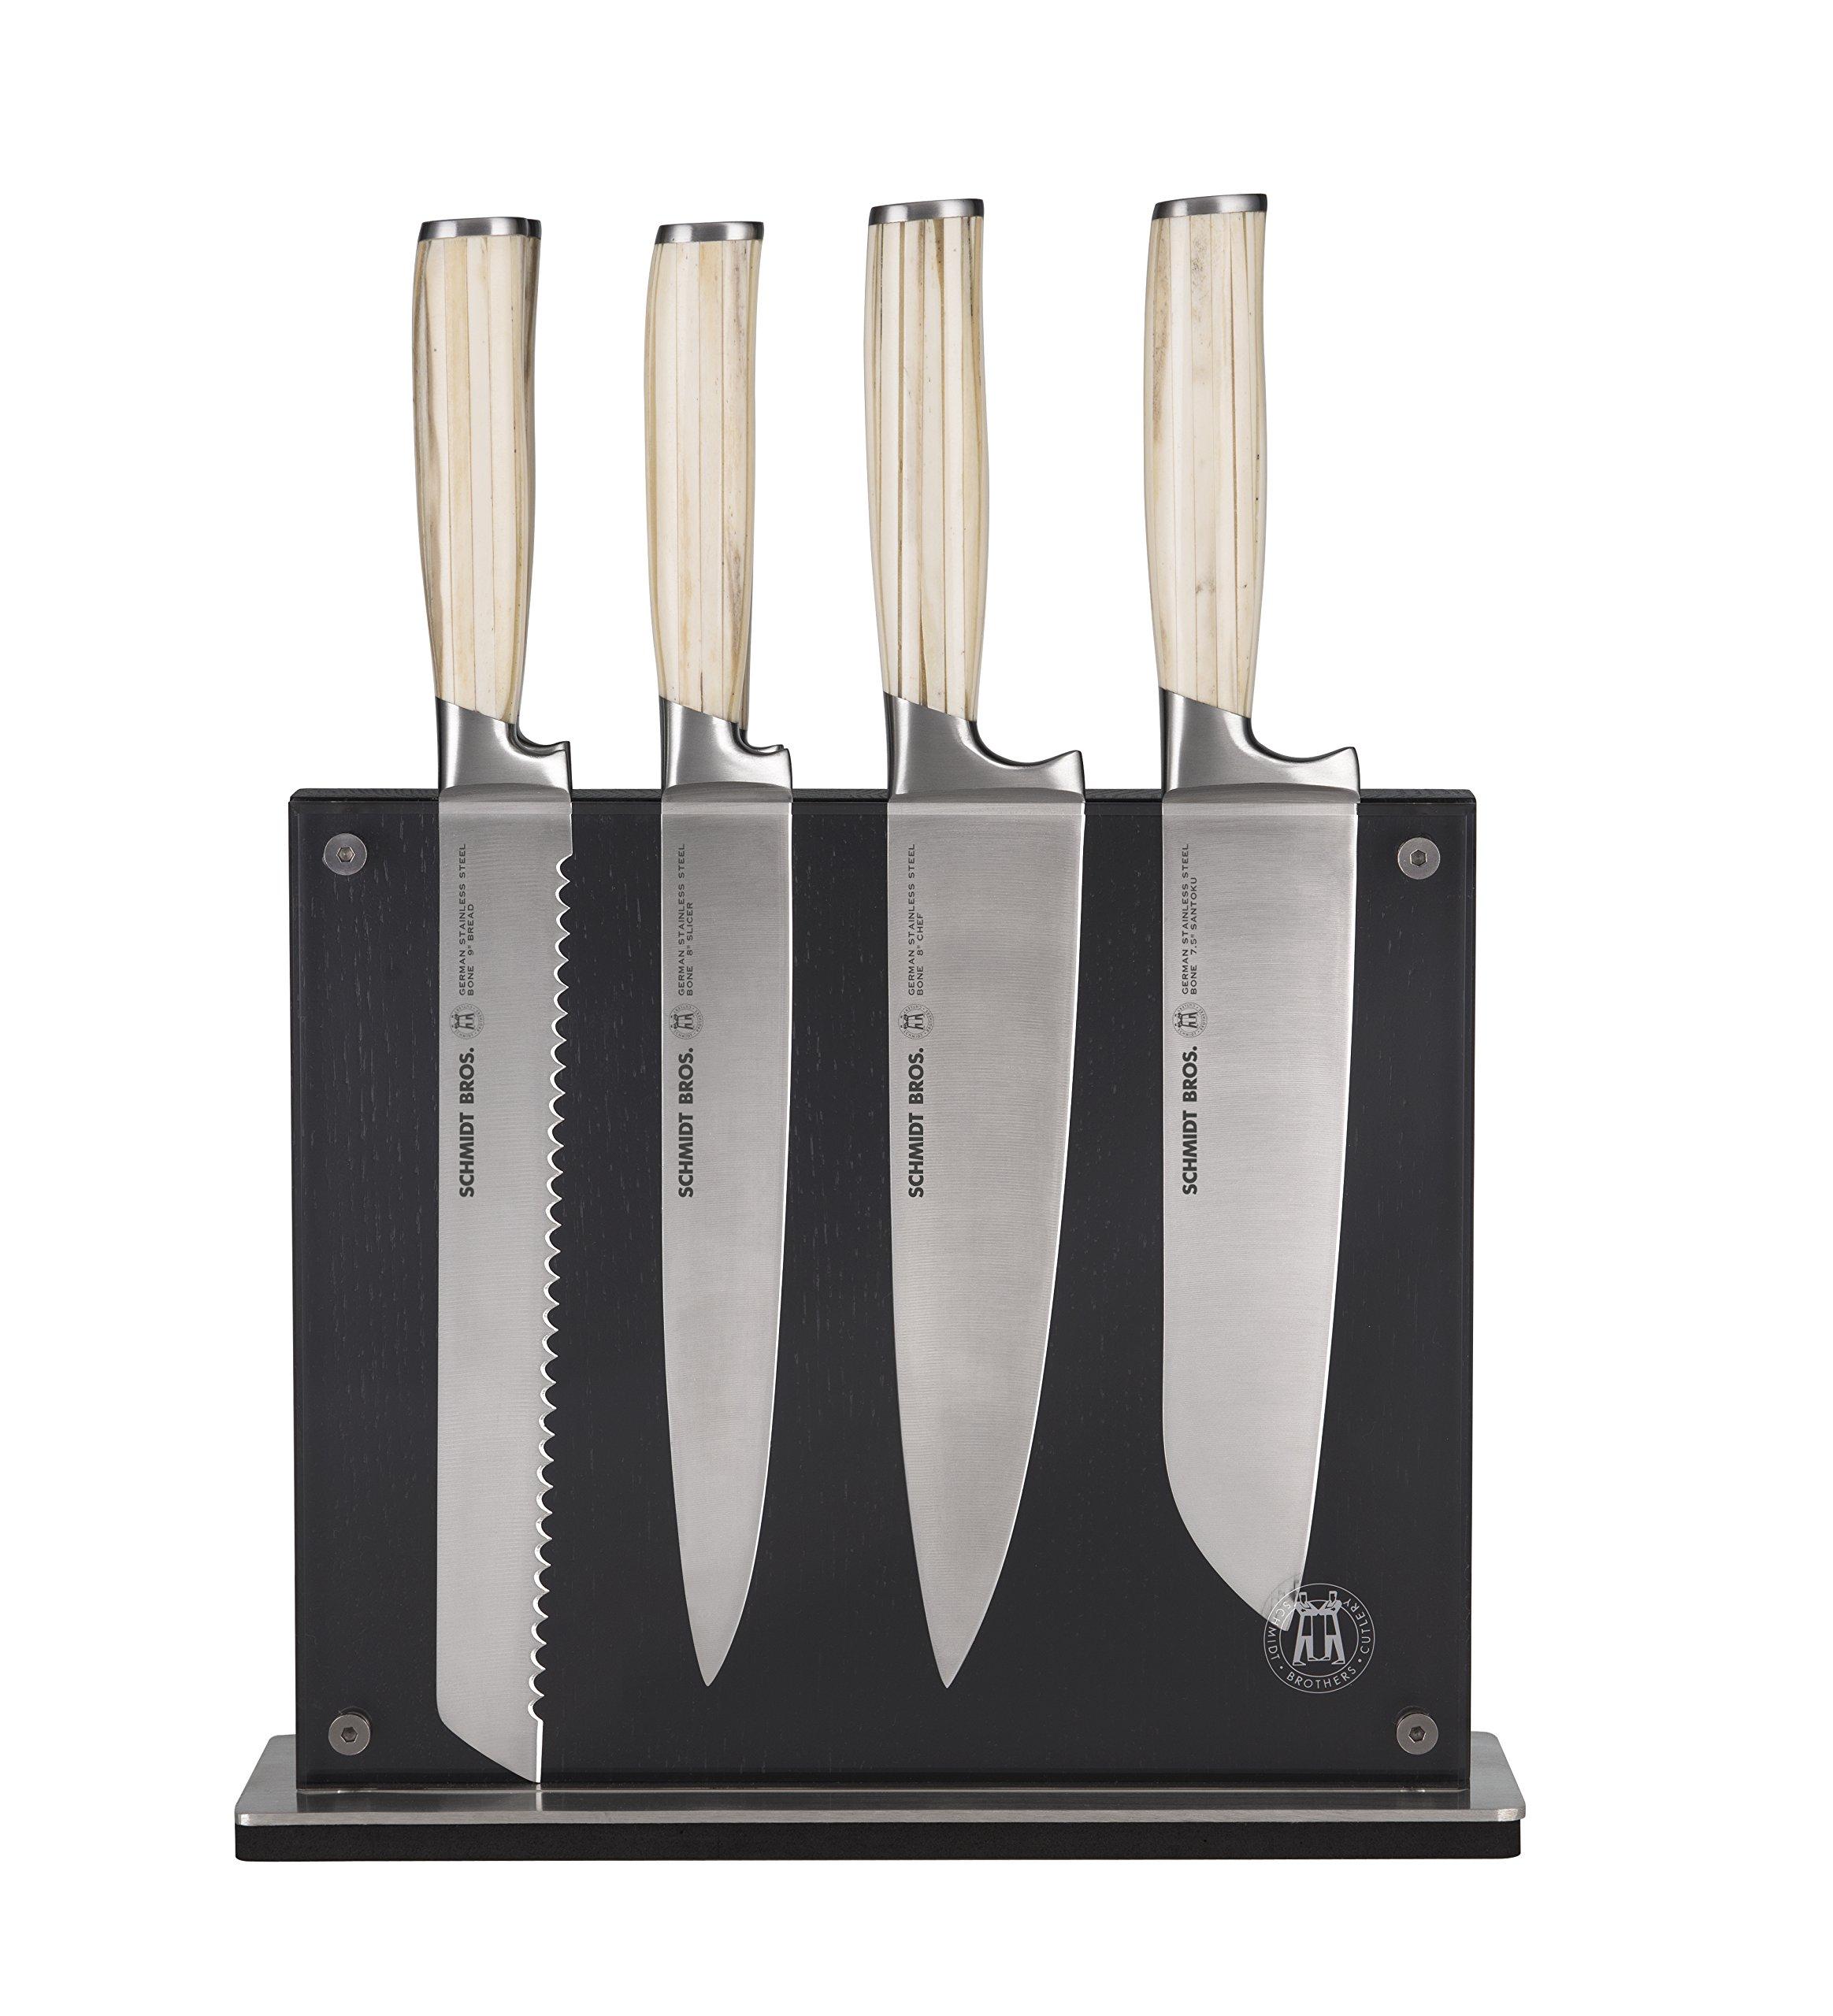 Hudson Home Schmidt Brothers Cutlery, SBBOS07,#20 Bone 7pc set, White